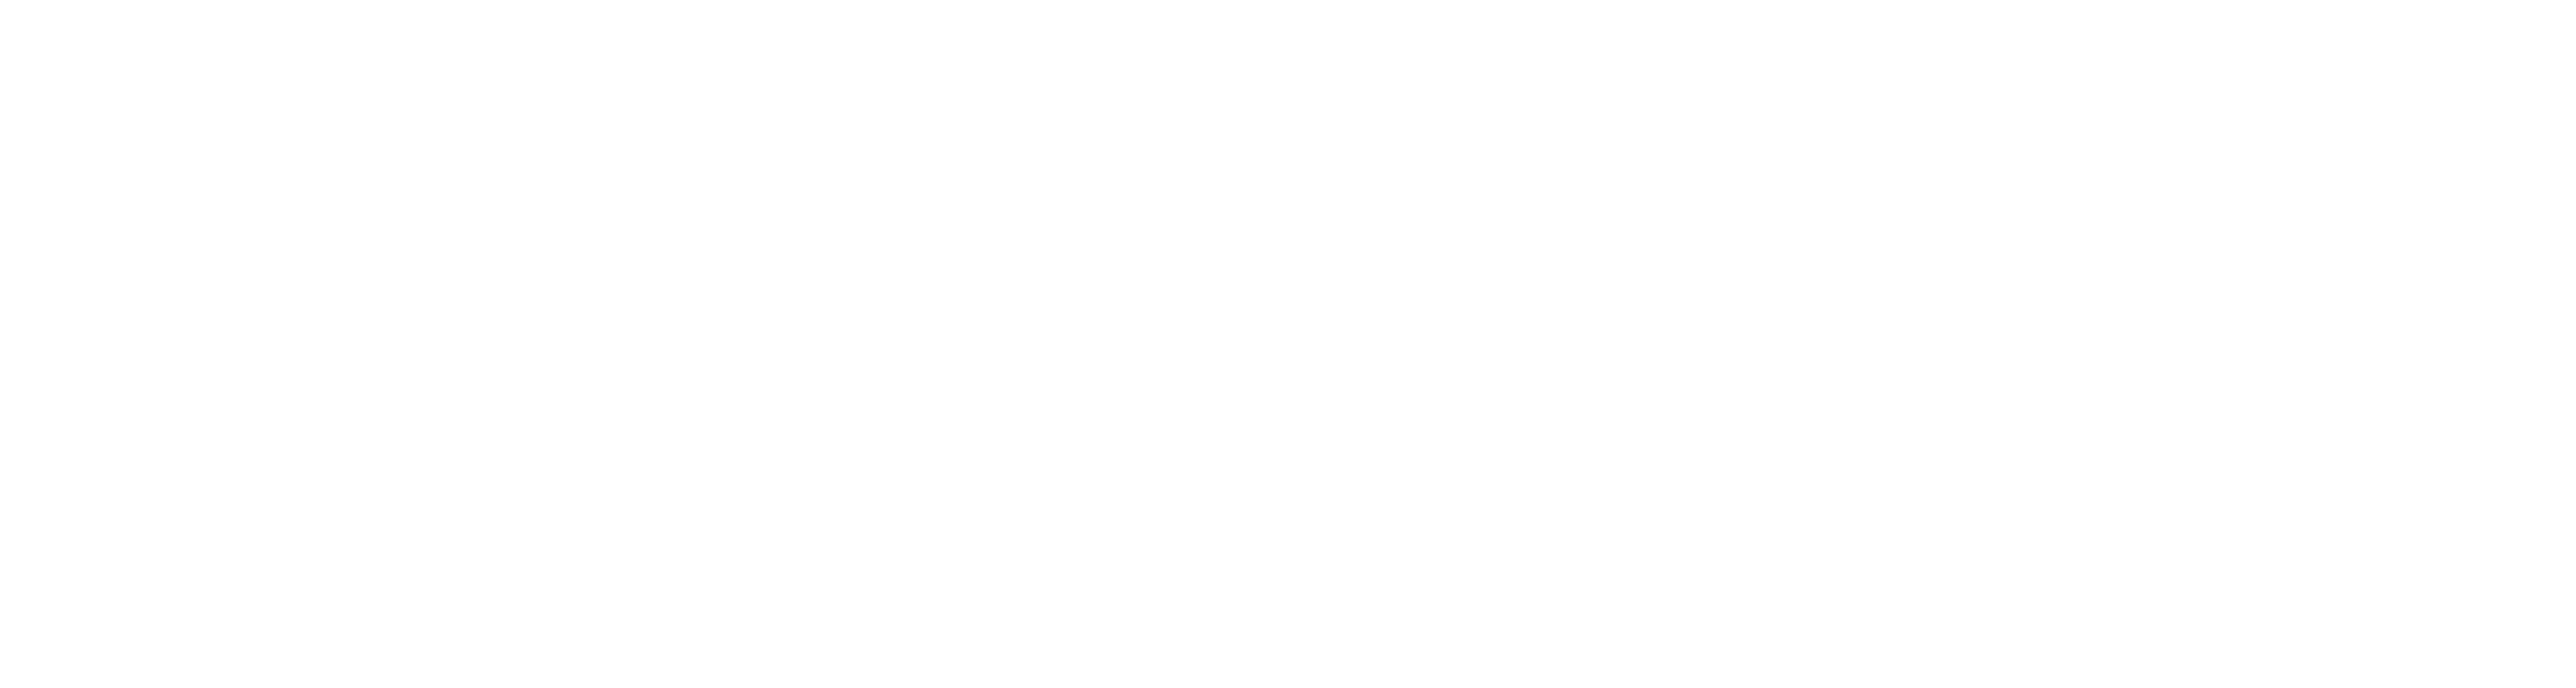 Cinnux BV